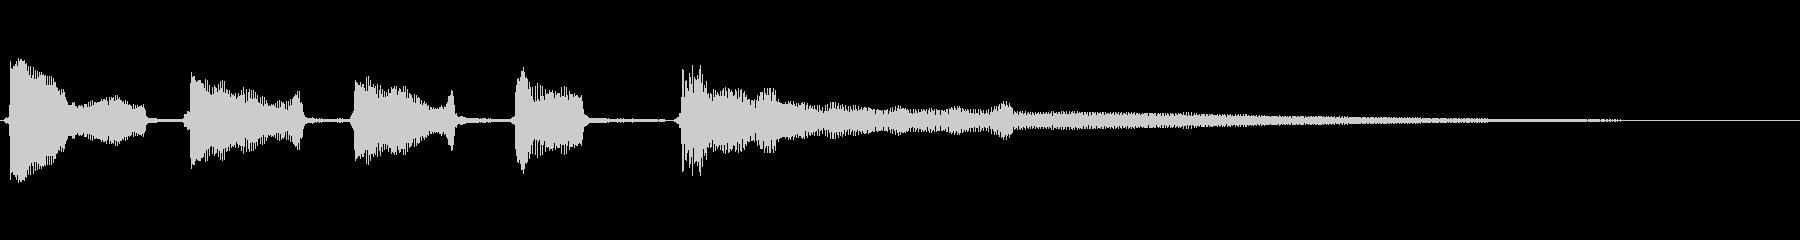 ファンファンファンファンファーンの未再生の波形